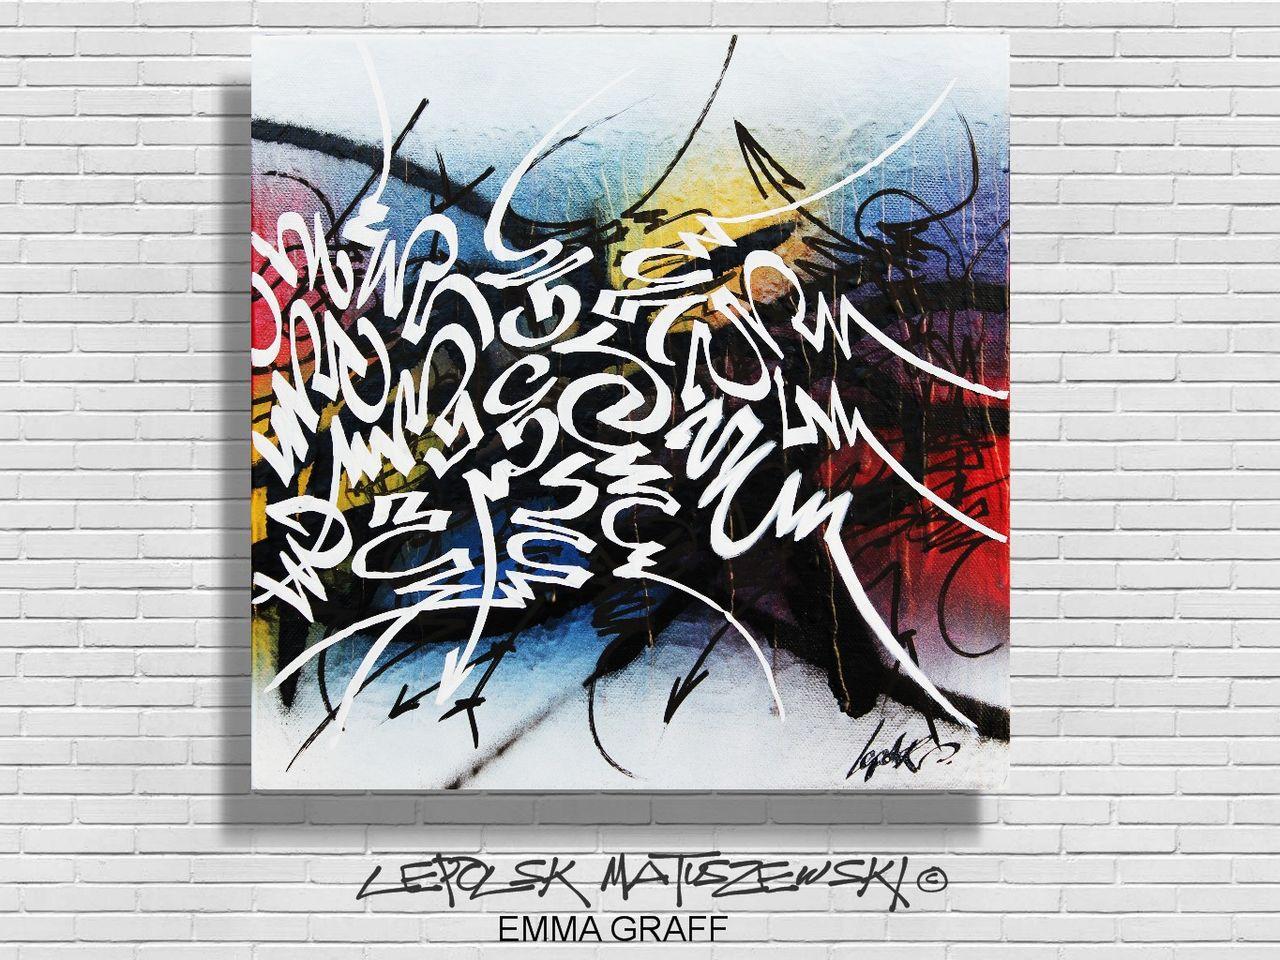 MISTER K  (Lepolsk Matuszewski) EMMA  STREET street art calligraffiti graffiti abstrait